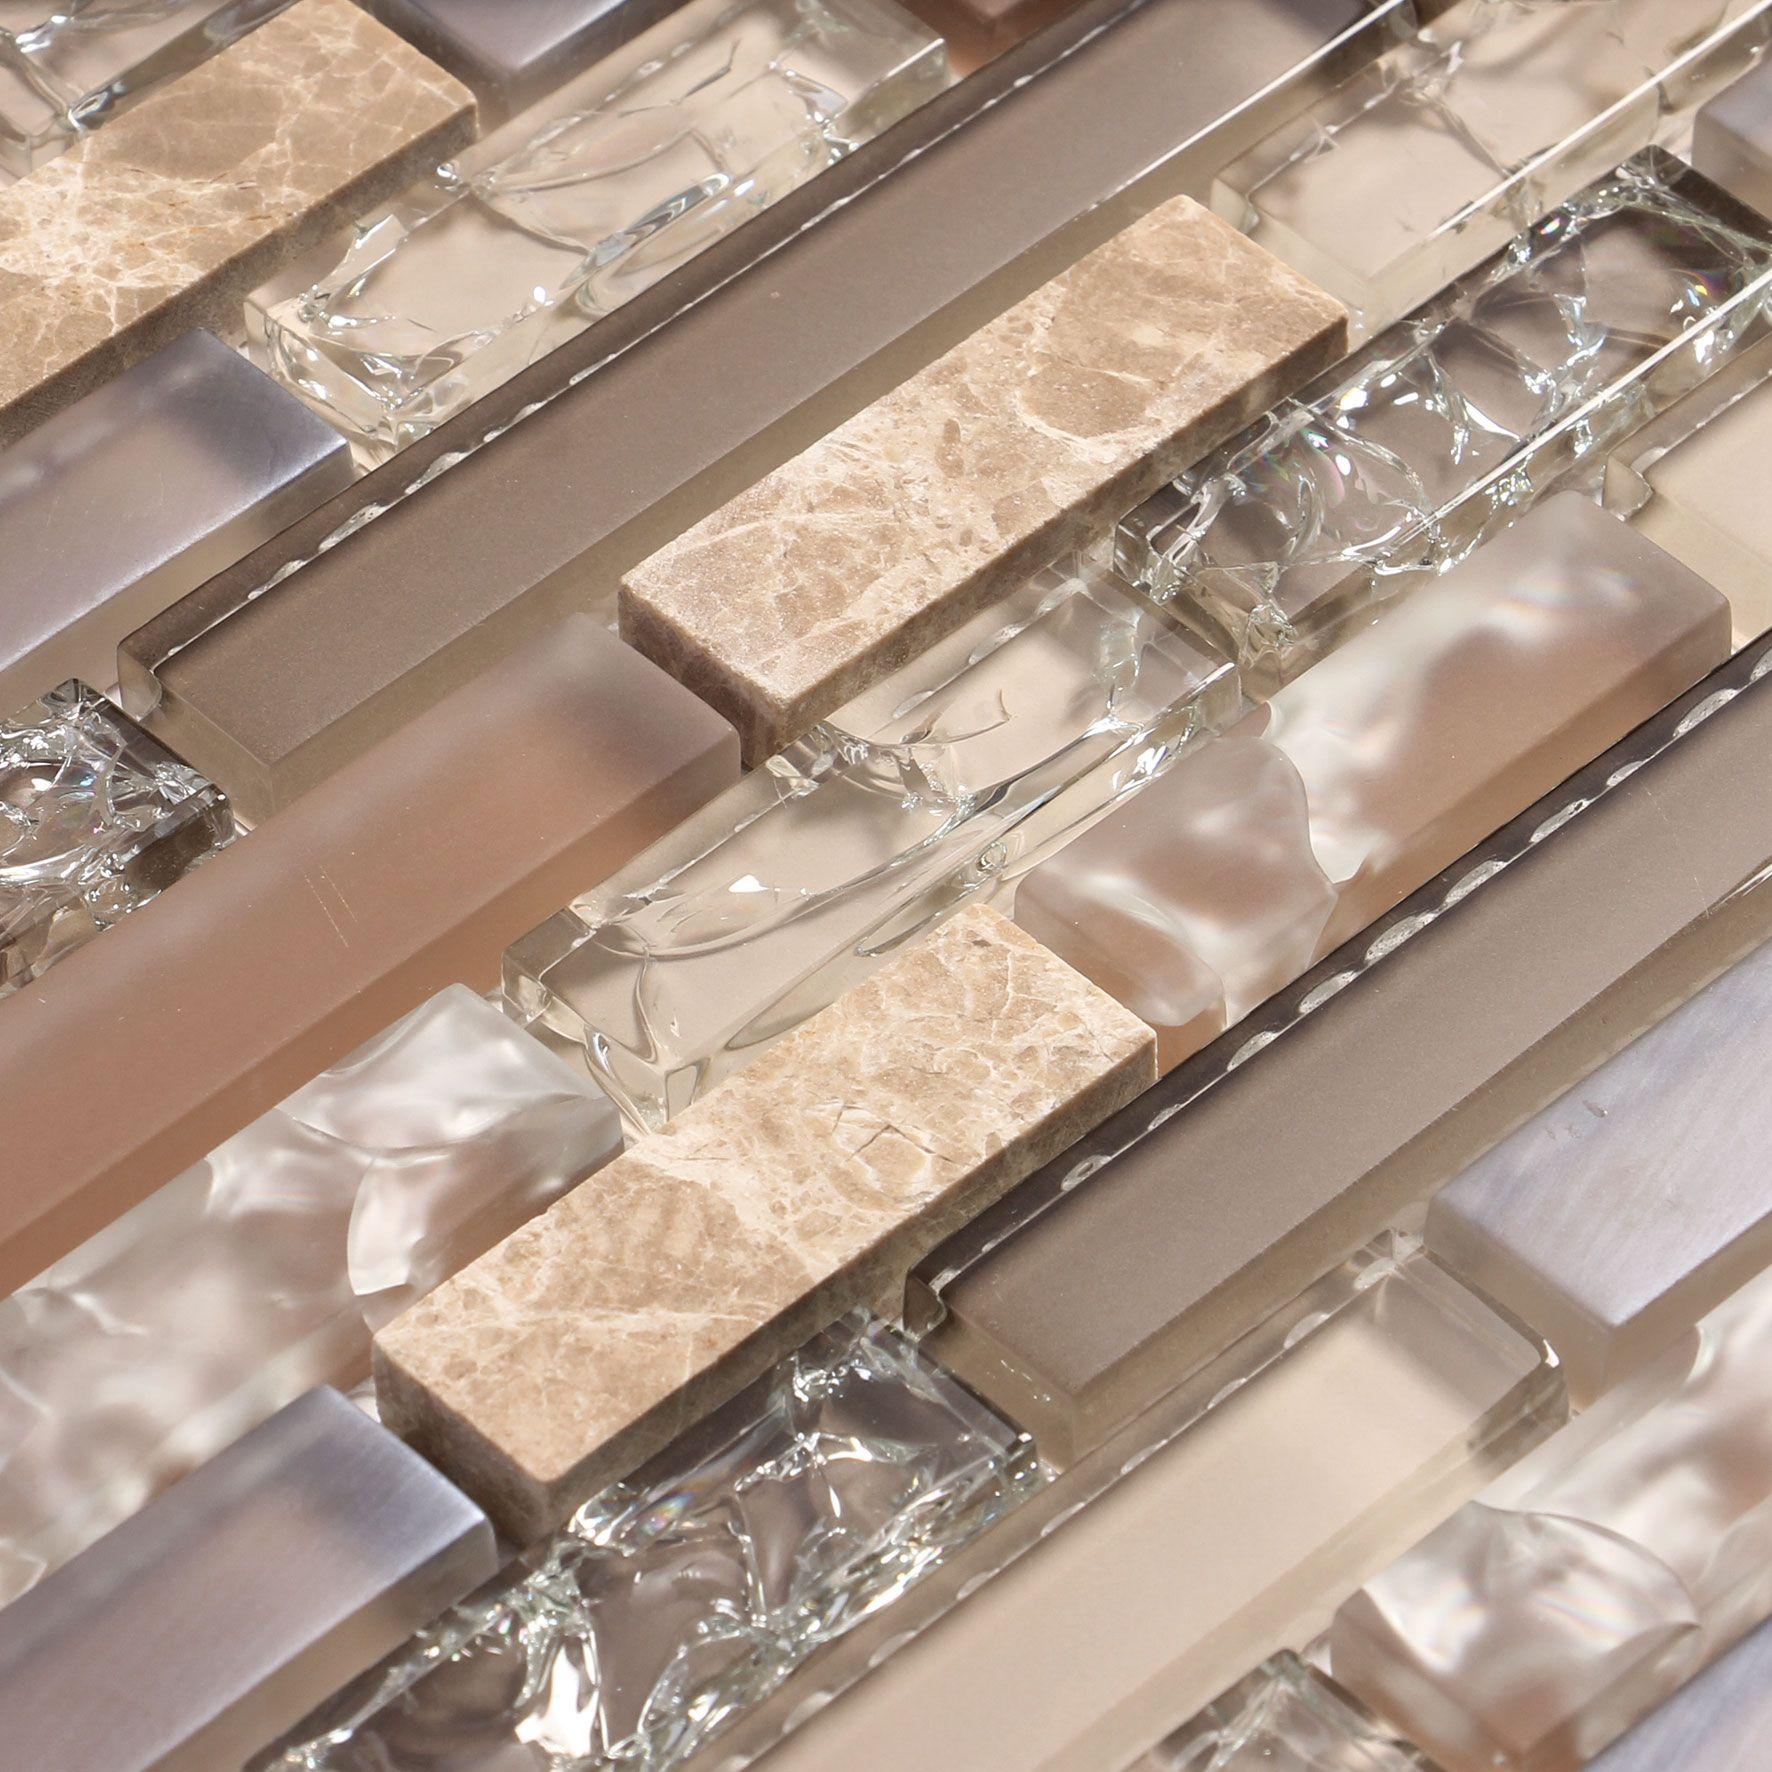 glass tile kitchen backsplash Beige and tan cracked glass tile with stone backsplash tile Eros 4 mosaic glass